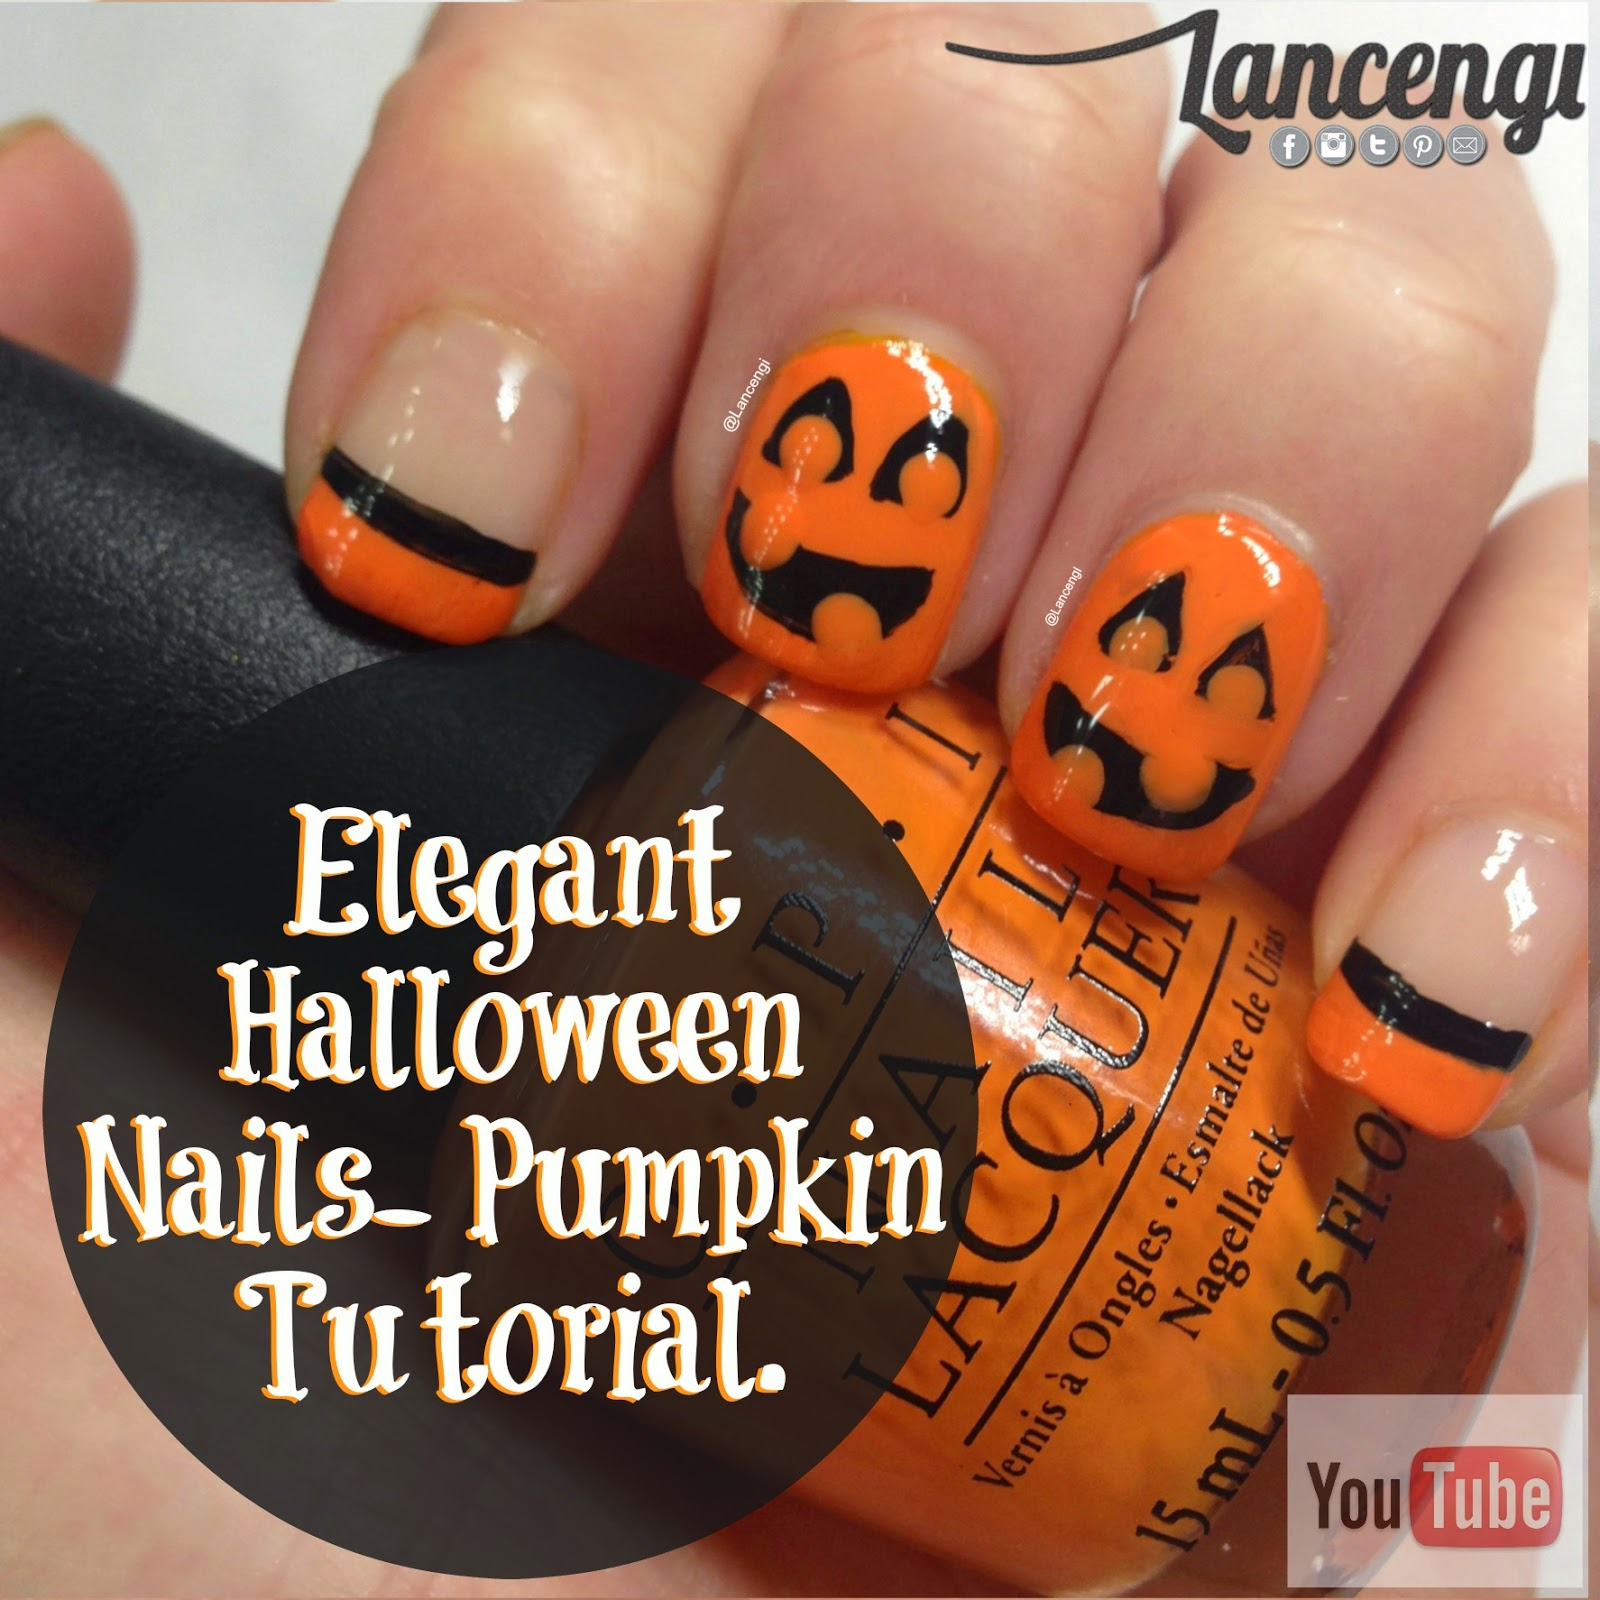 Top 3 pumpkin nails for fall lancengi manicure 1 cute pumpkin manicure 053 prinsesfo Choice Image